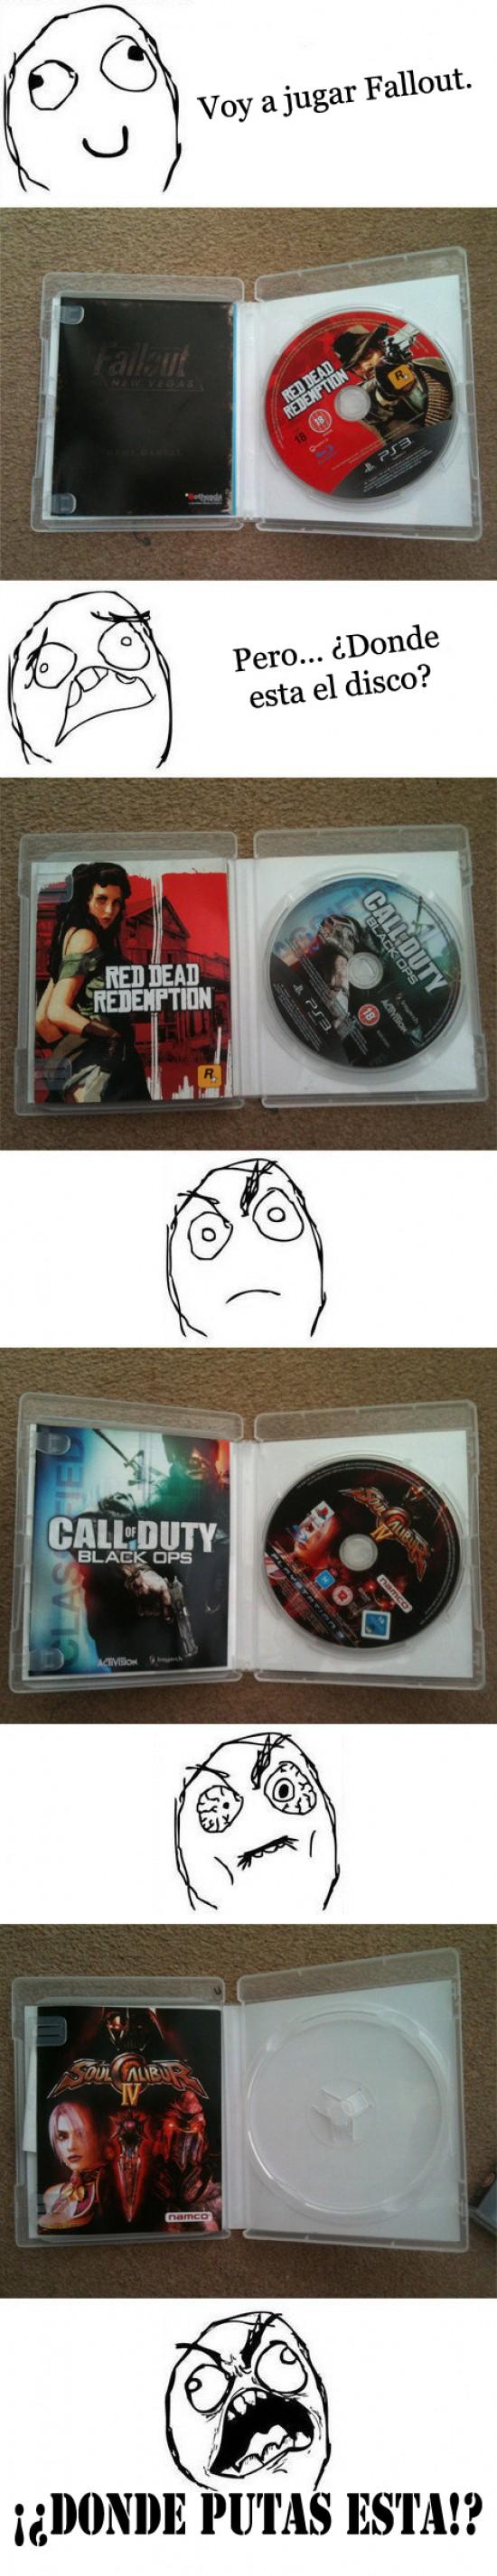 Ffffuuuuuuuuuu - A saber donde dejas los cds